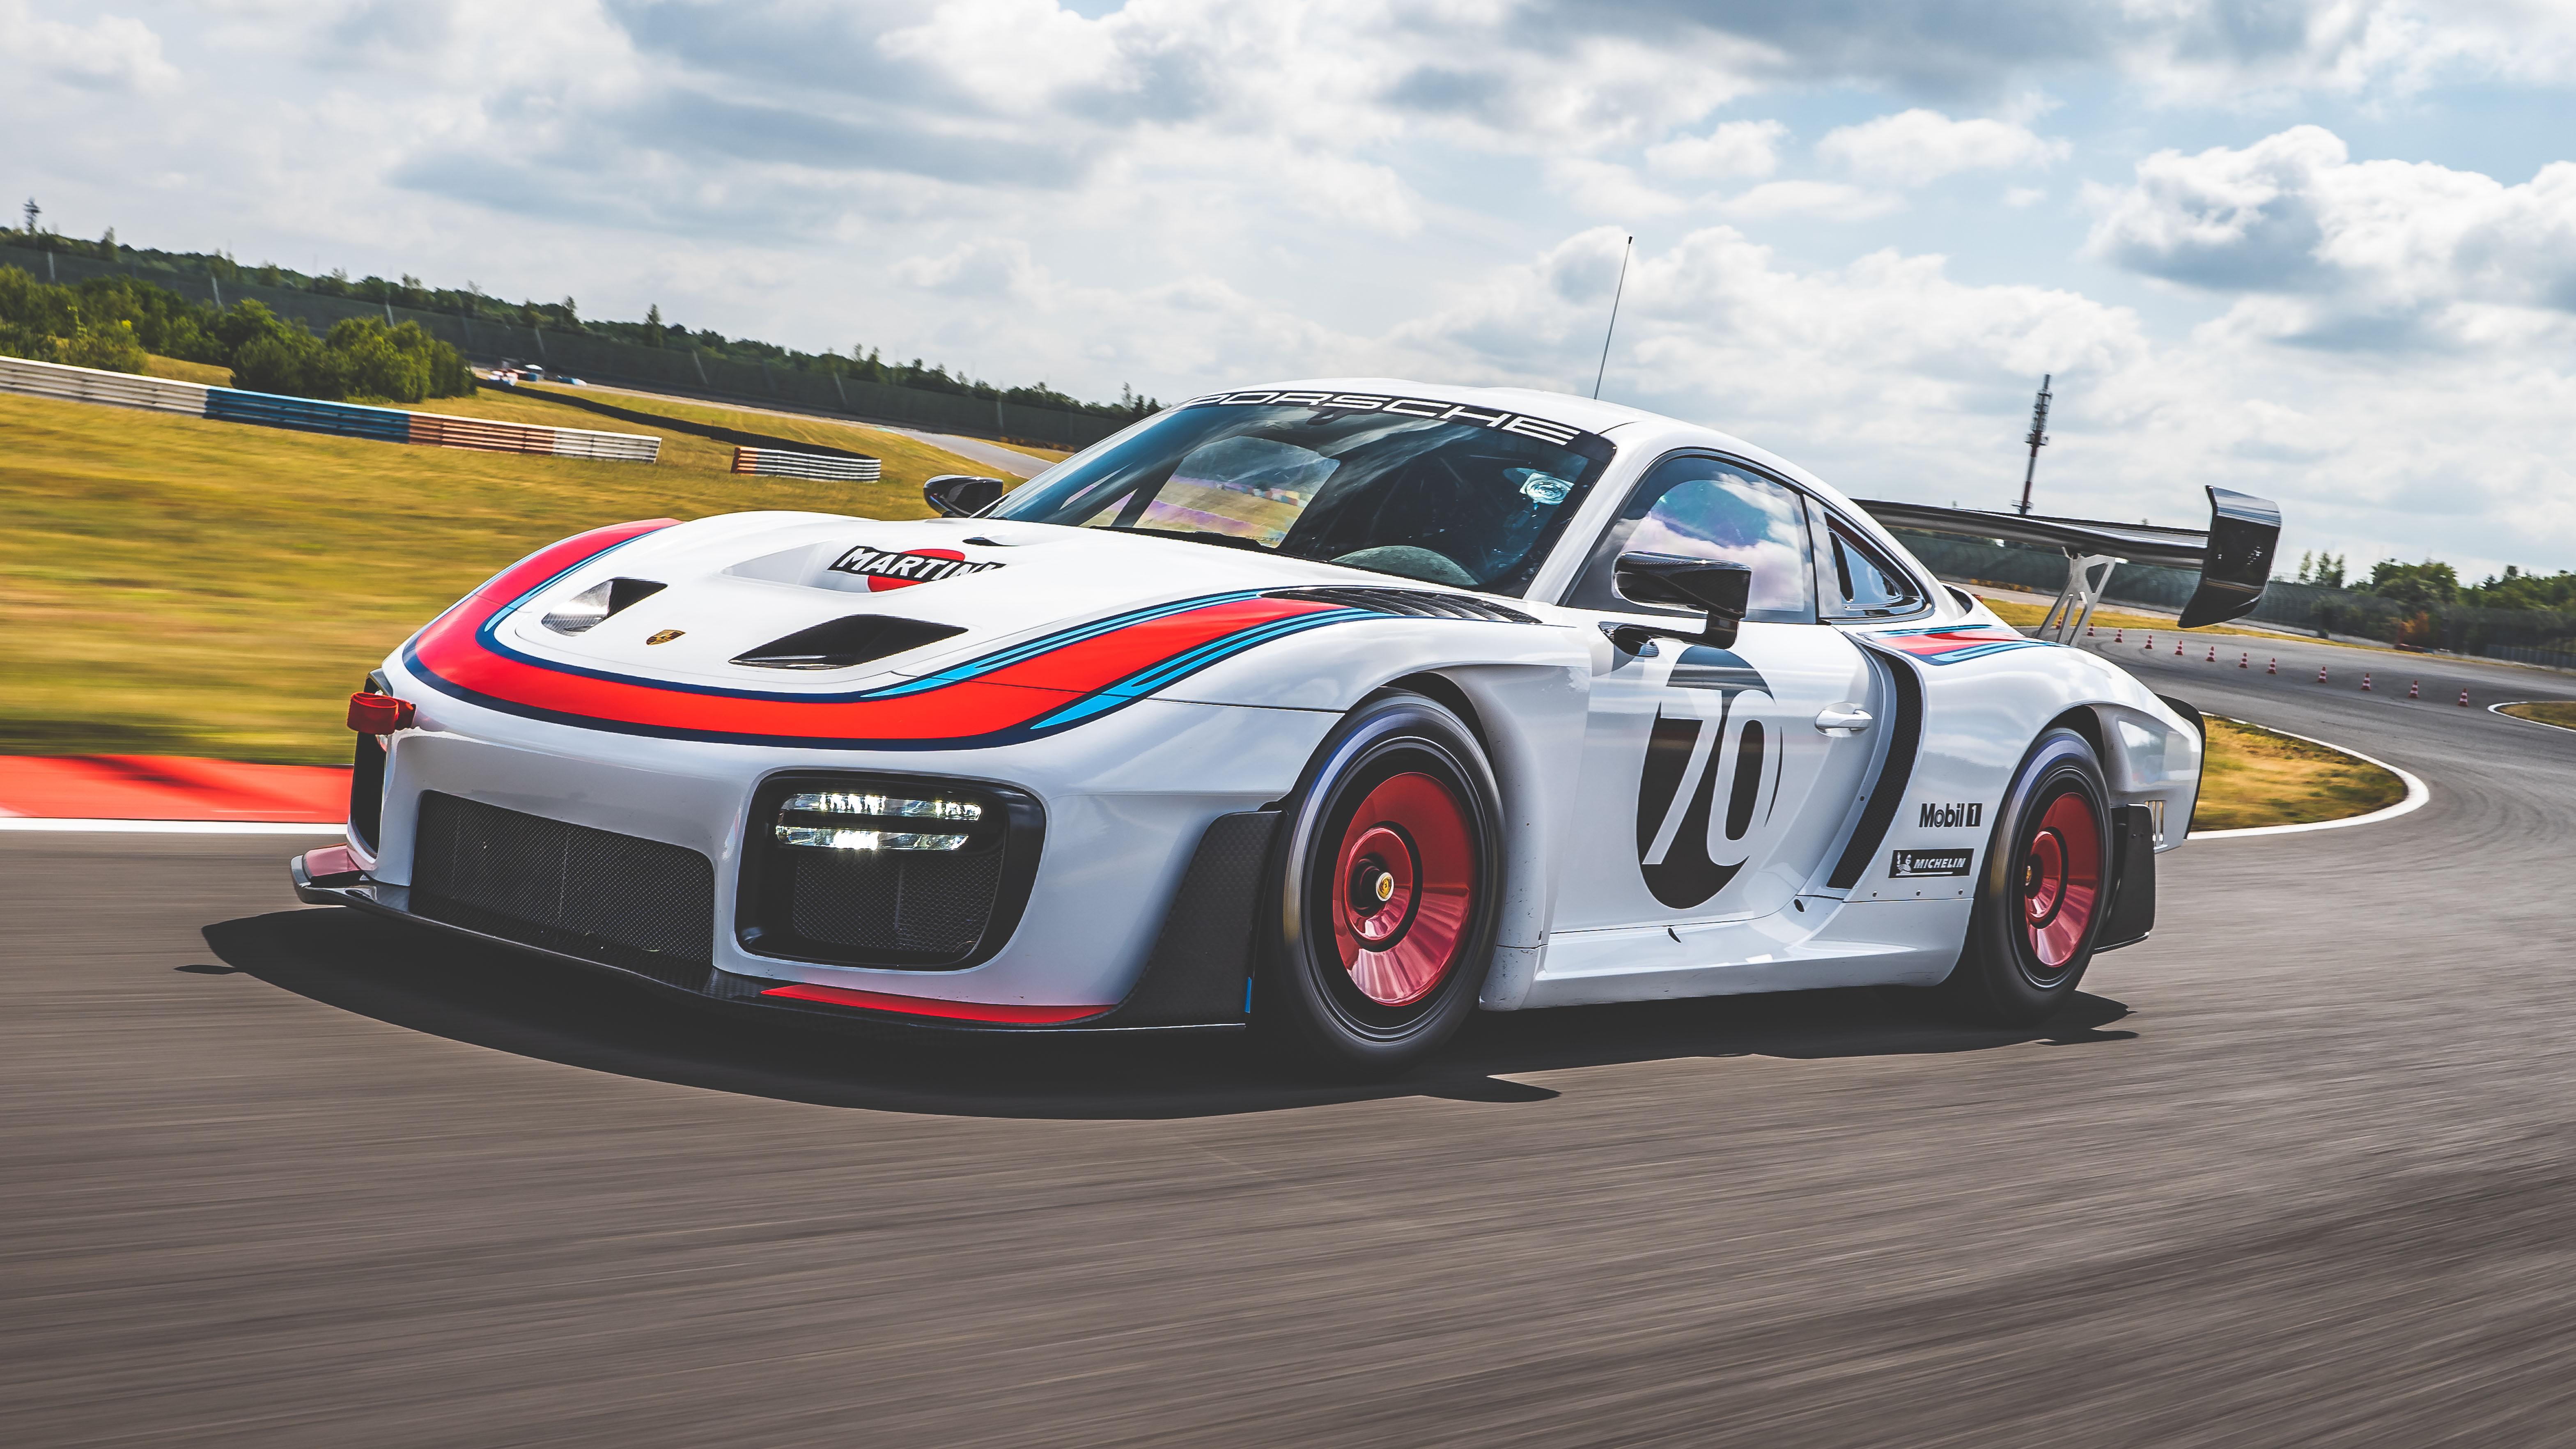 Porsche 935 review: £750k track-racer tested | Top Gear